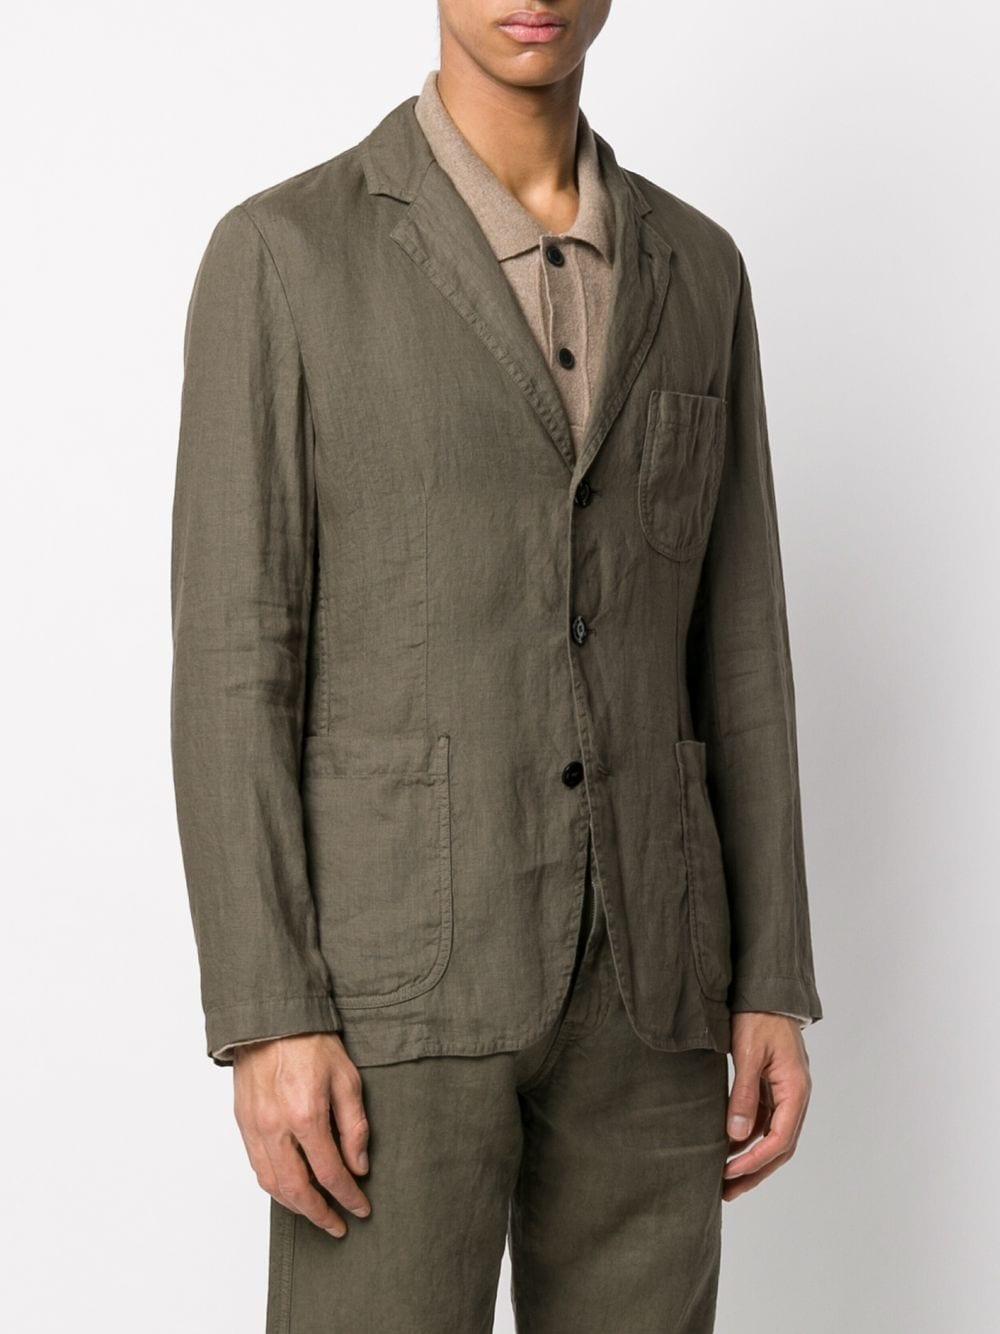 Aspesi giacca in lino uomo ASPESI | Giacche | CJ65 C19585390